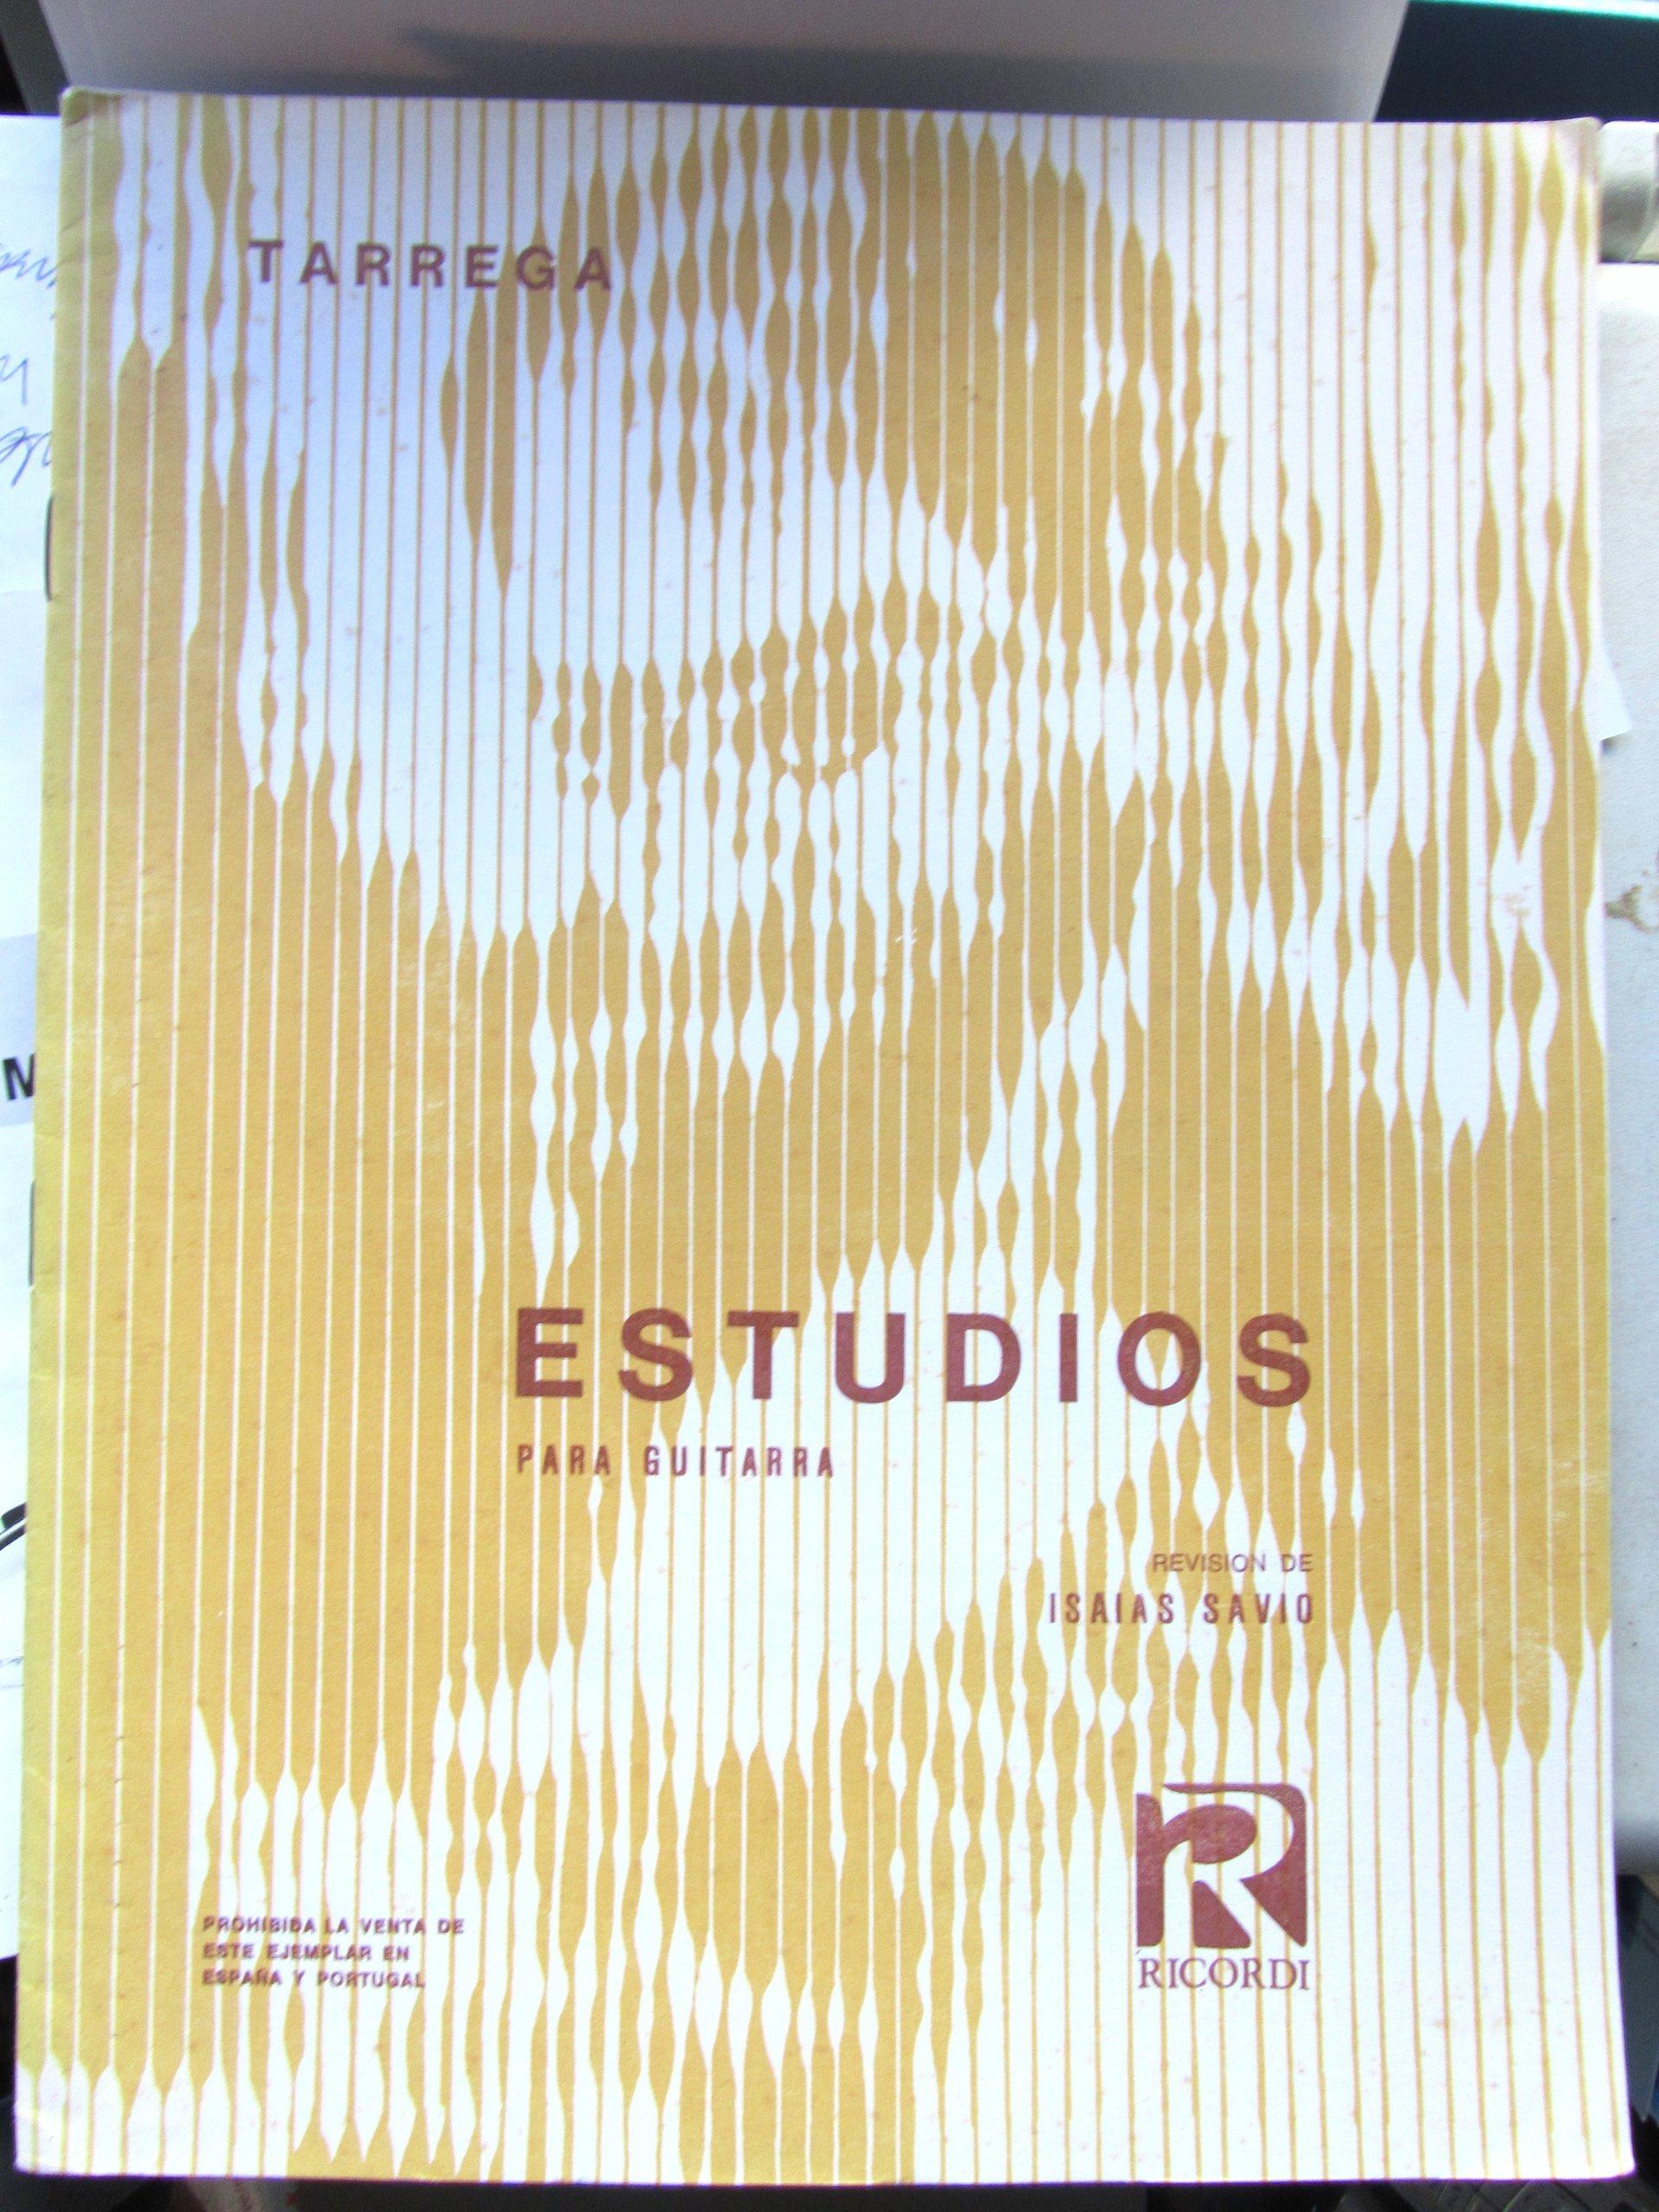 TARREGA - Estudios para Guitarra (Savio): Amazon.es: TARREGA: Libros